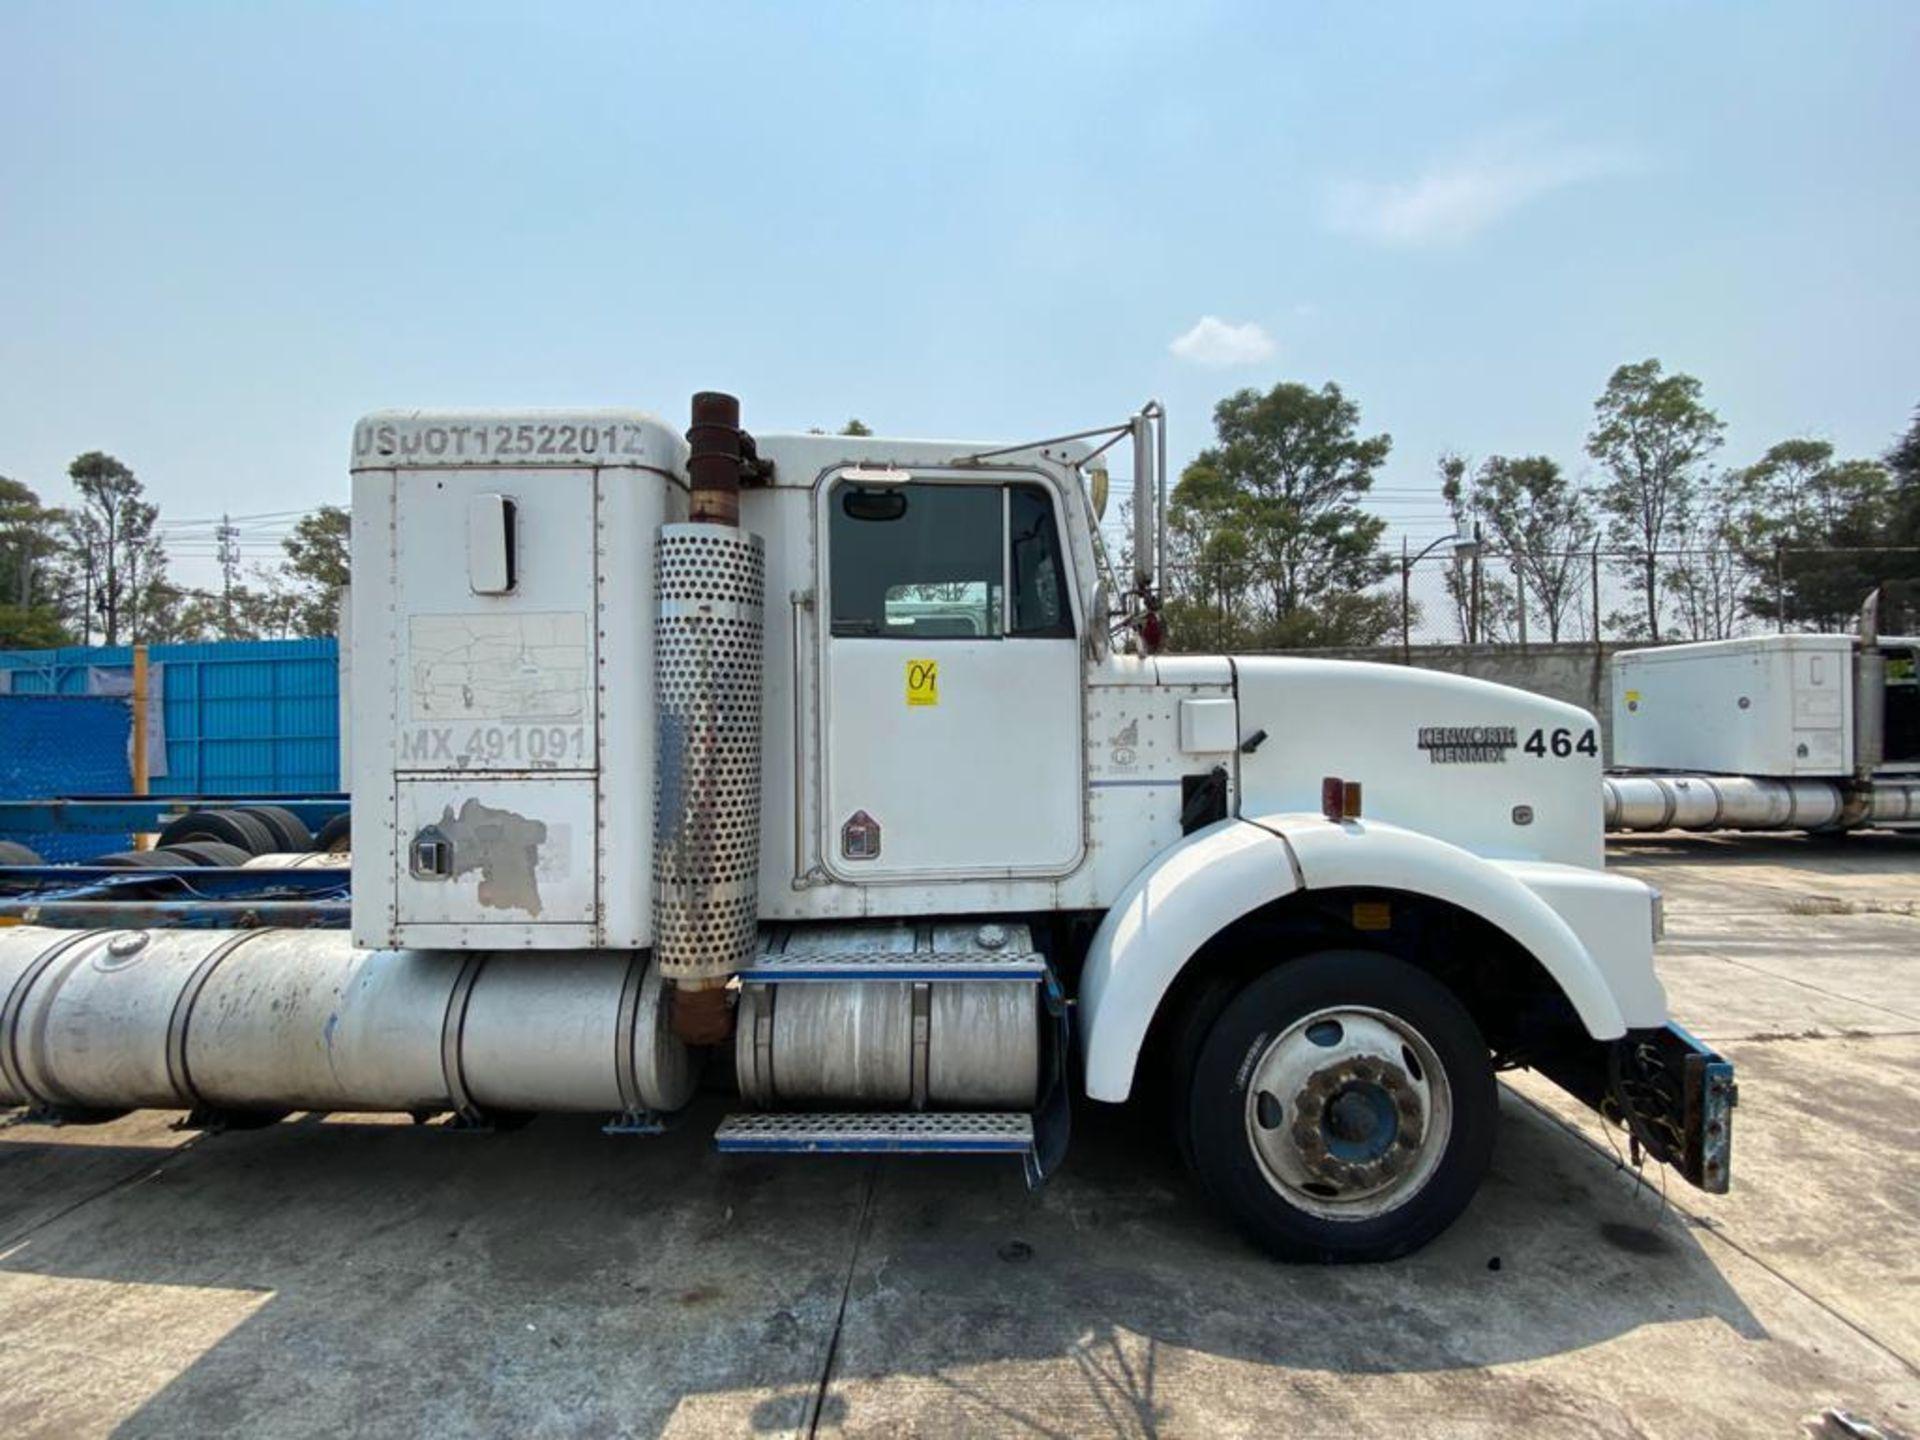 1999 Kenworth Sleeper truck tractor, standard transmission of 18 speeds - Image 50 of 70